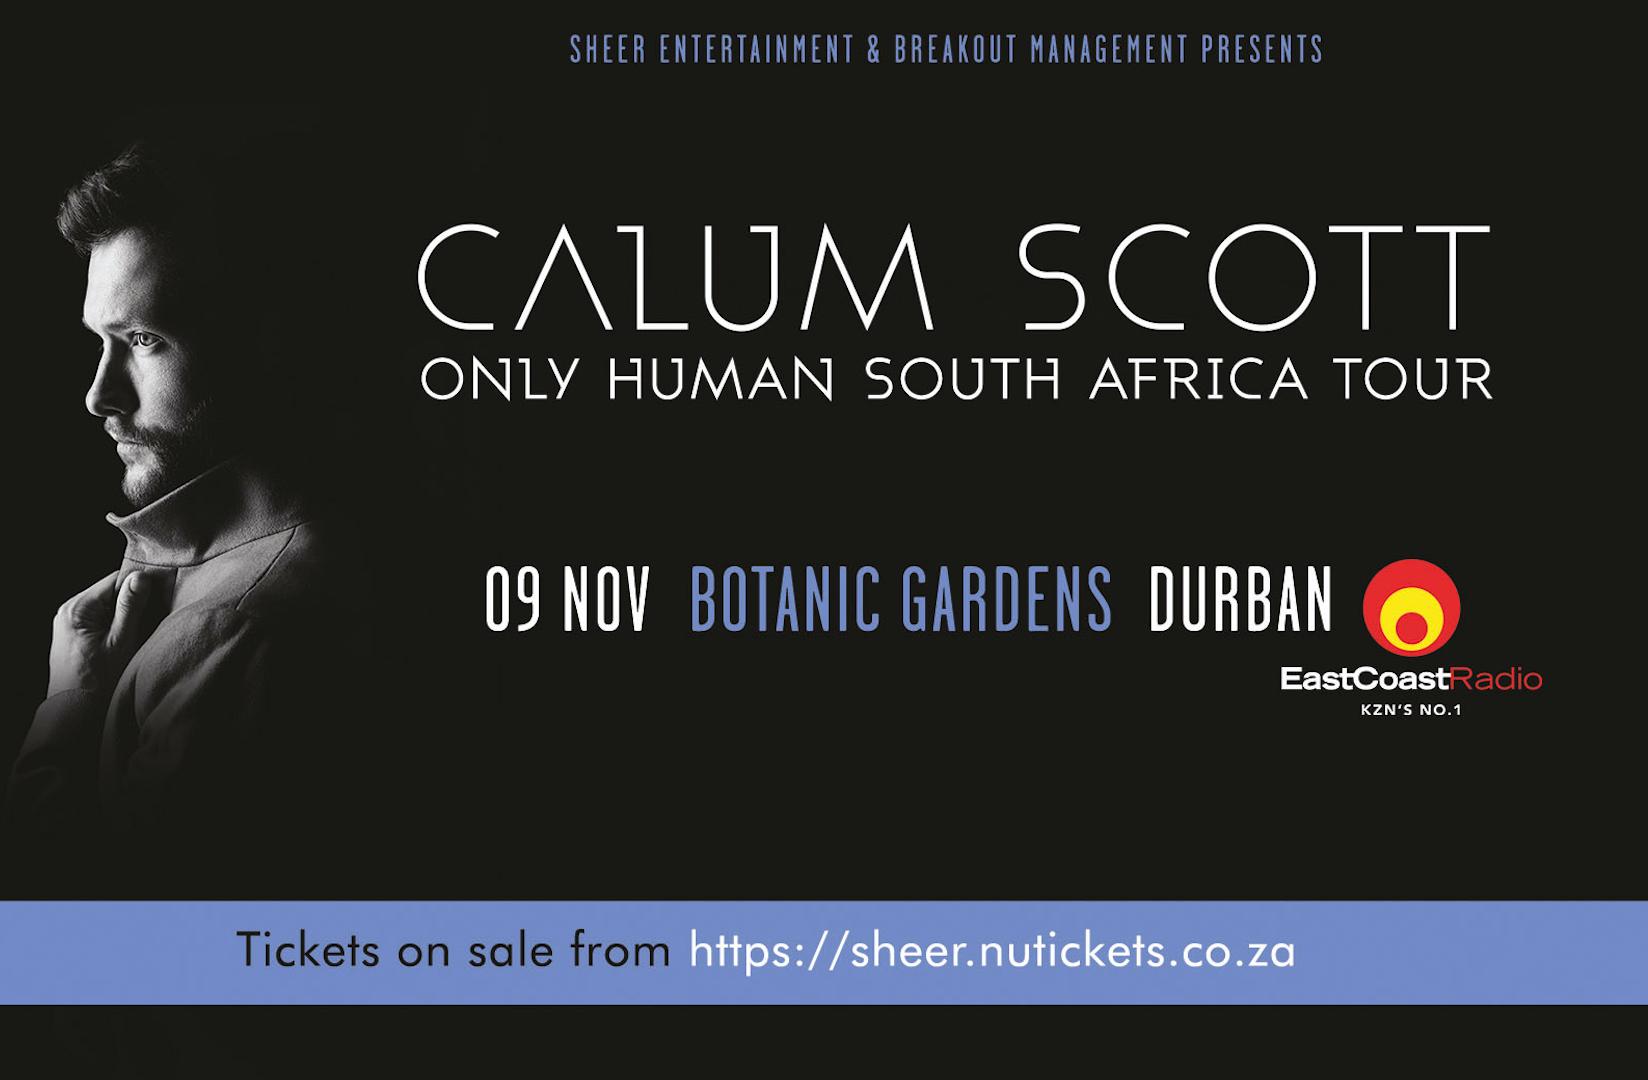 calum scott event artwork concert